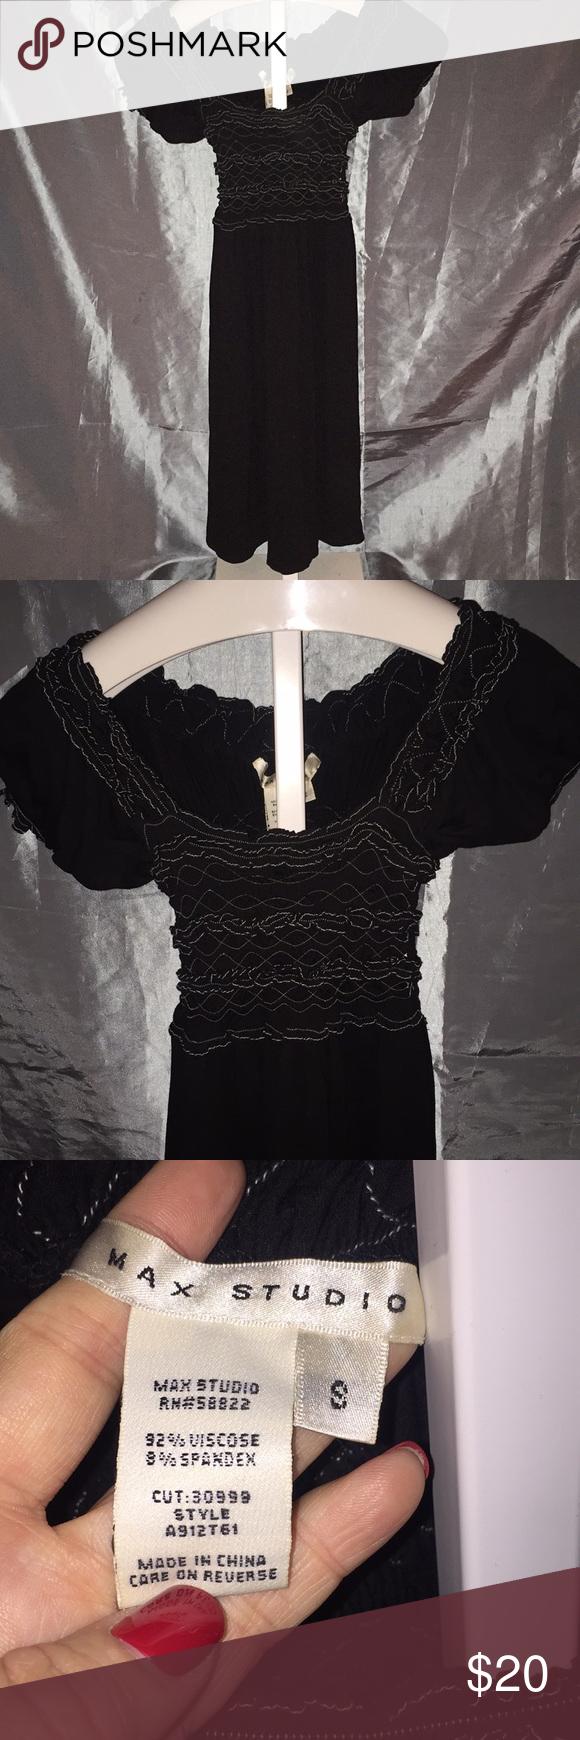 Max Studio Dress Black With Cream Stitching Max Studio Dress Black Dress Dresses [ 1740 x 580 Pixel ]